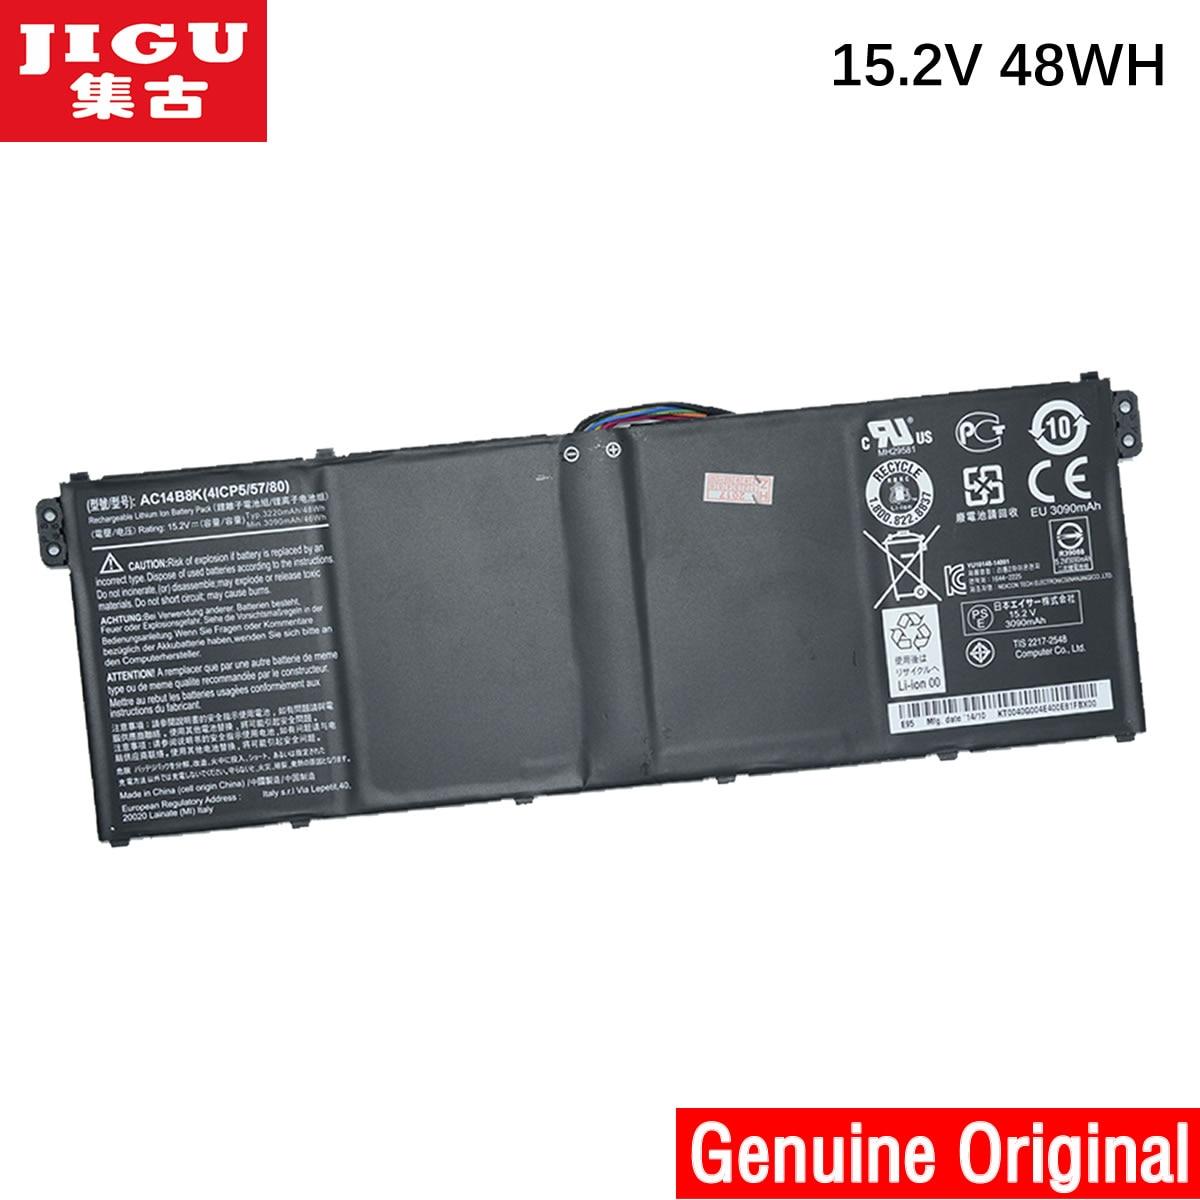 JIGU Laptop Battery E3-112 ES1-512 AC14B8K E5-771G Acer FOR E3-112/Cb3-111/Cb5-311/..